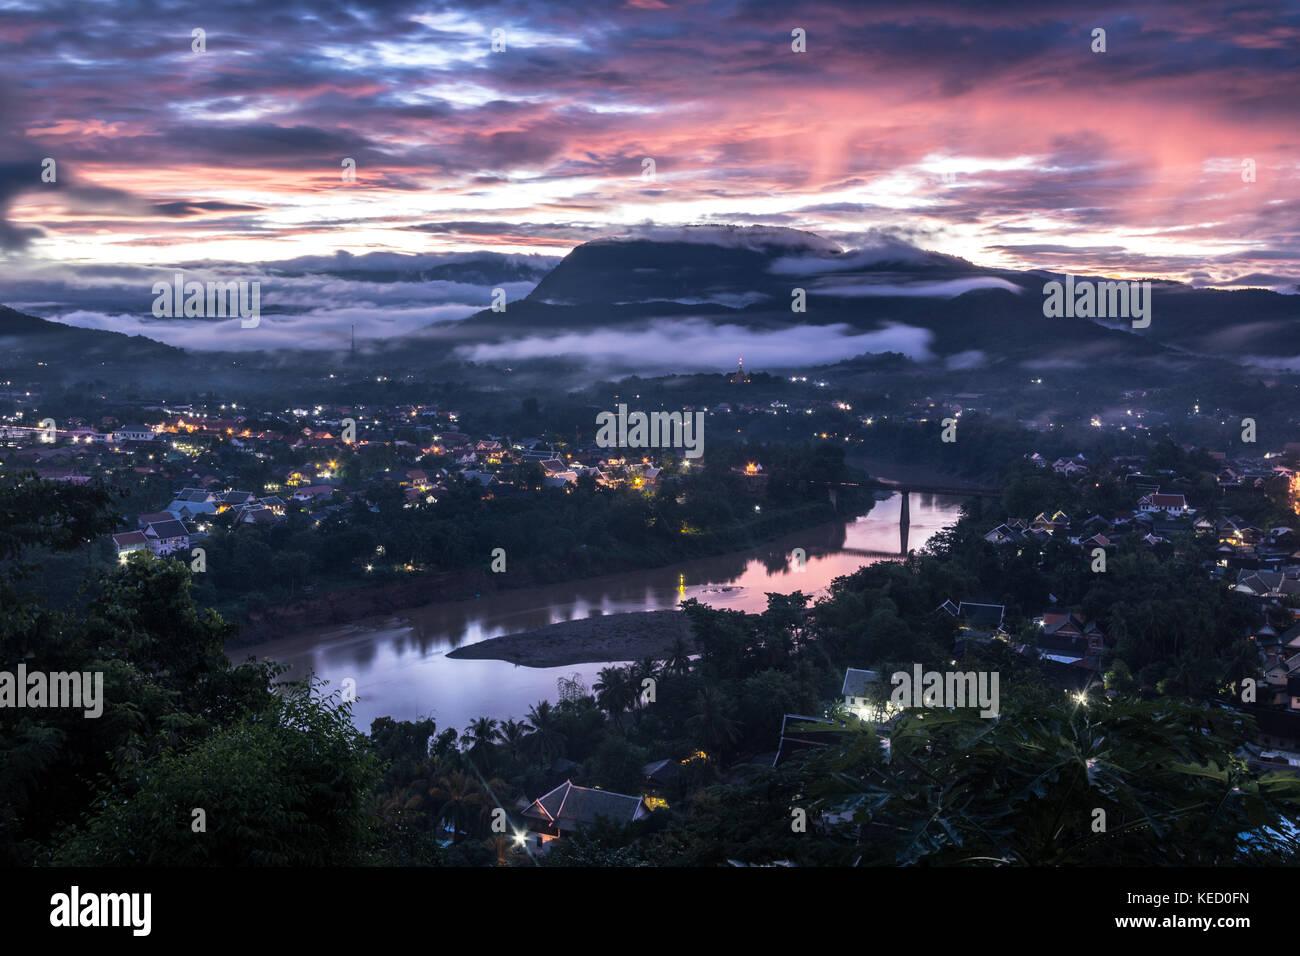 Sun Anfang über Luang Prabang steigen, nordlaos. Stockbild